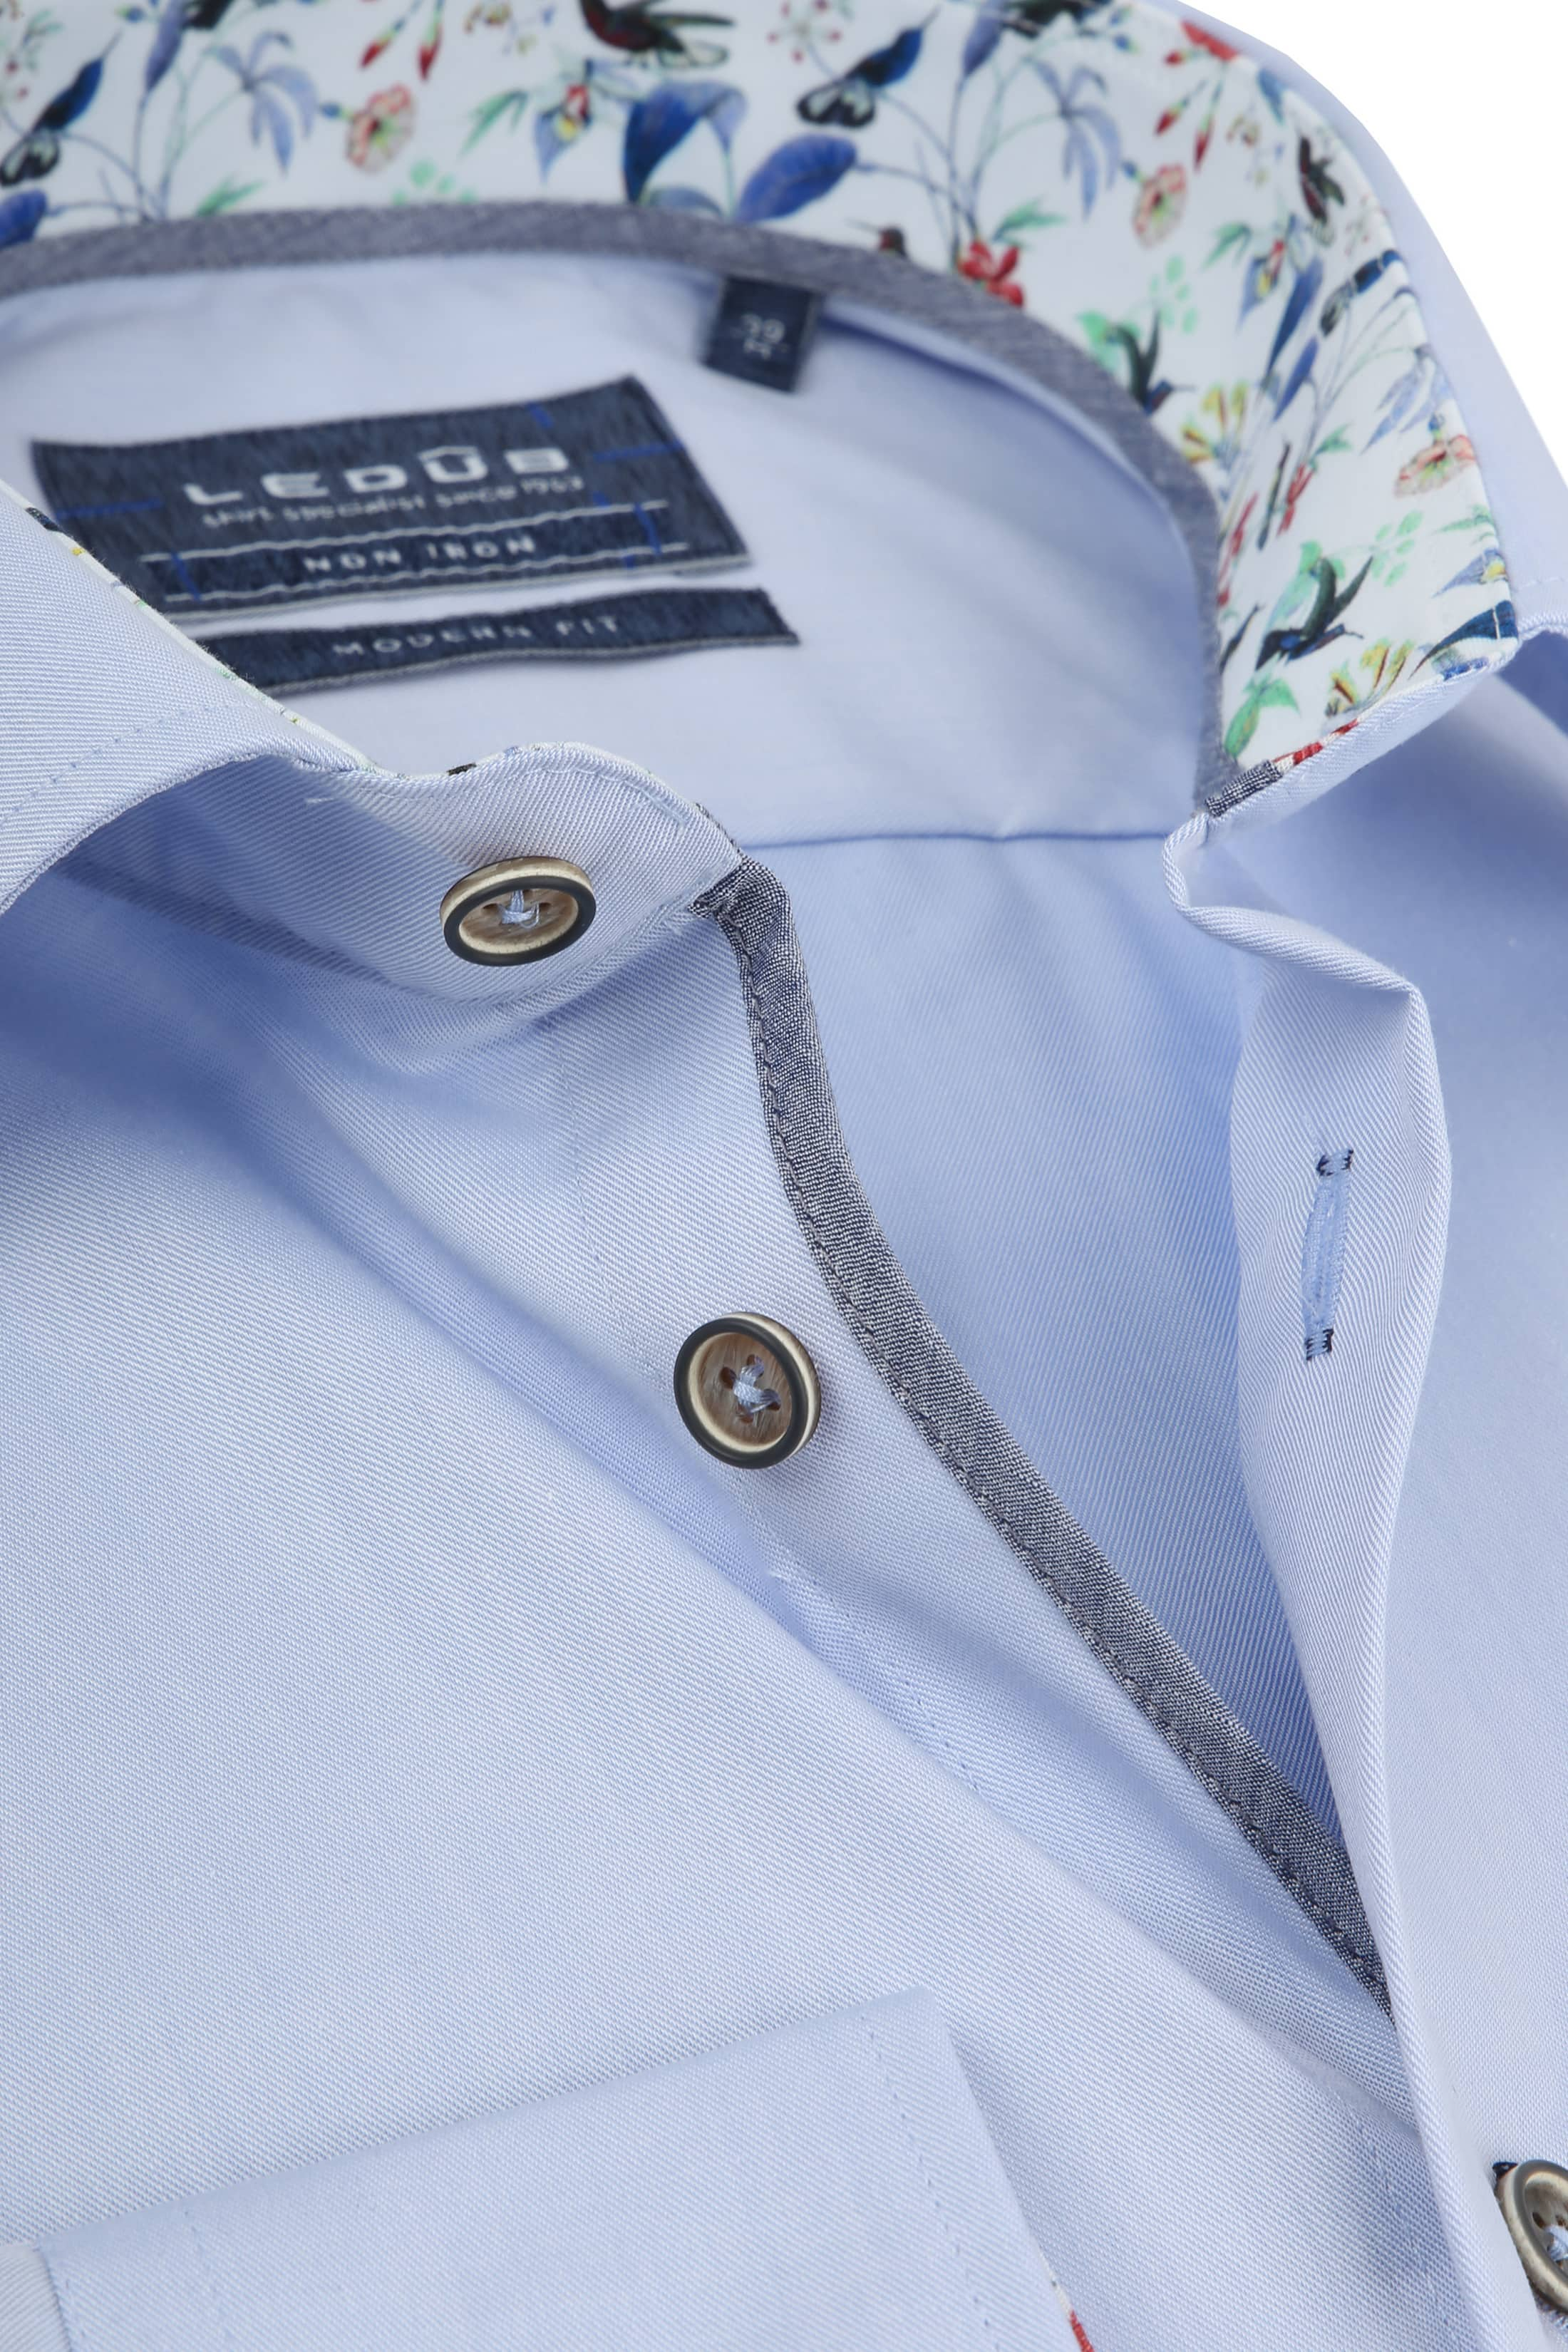 Ledub Overhemd Non Iron MF Blauw foto 1